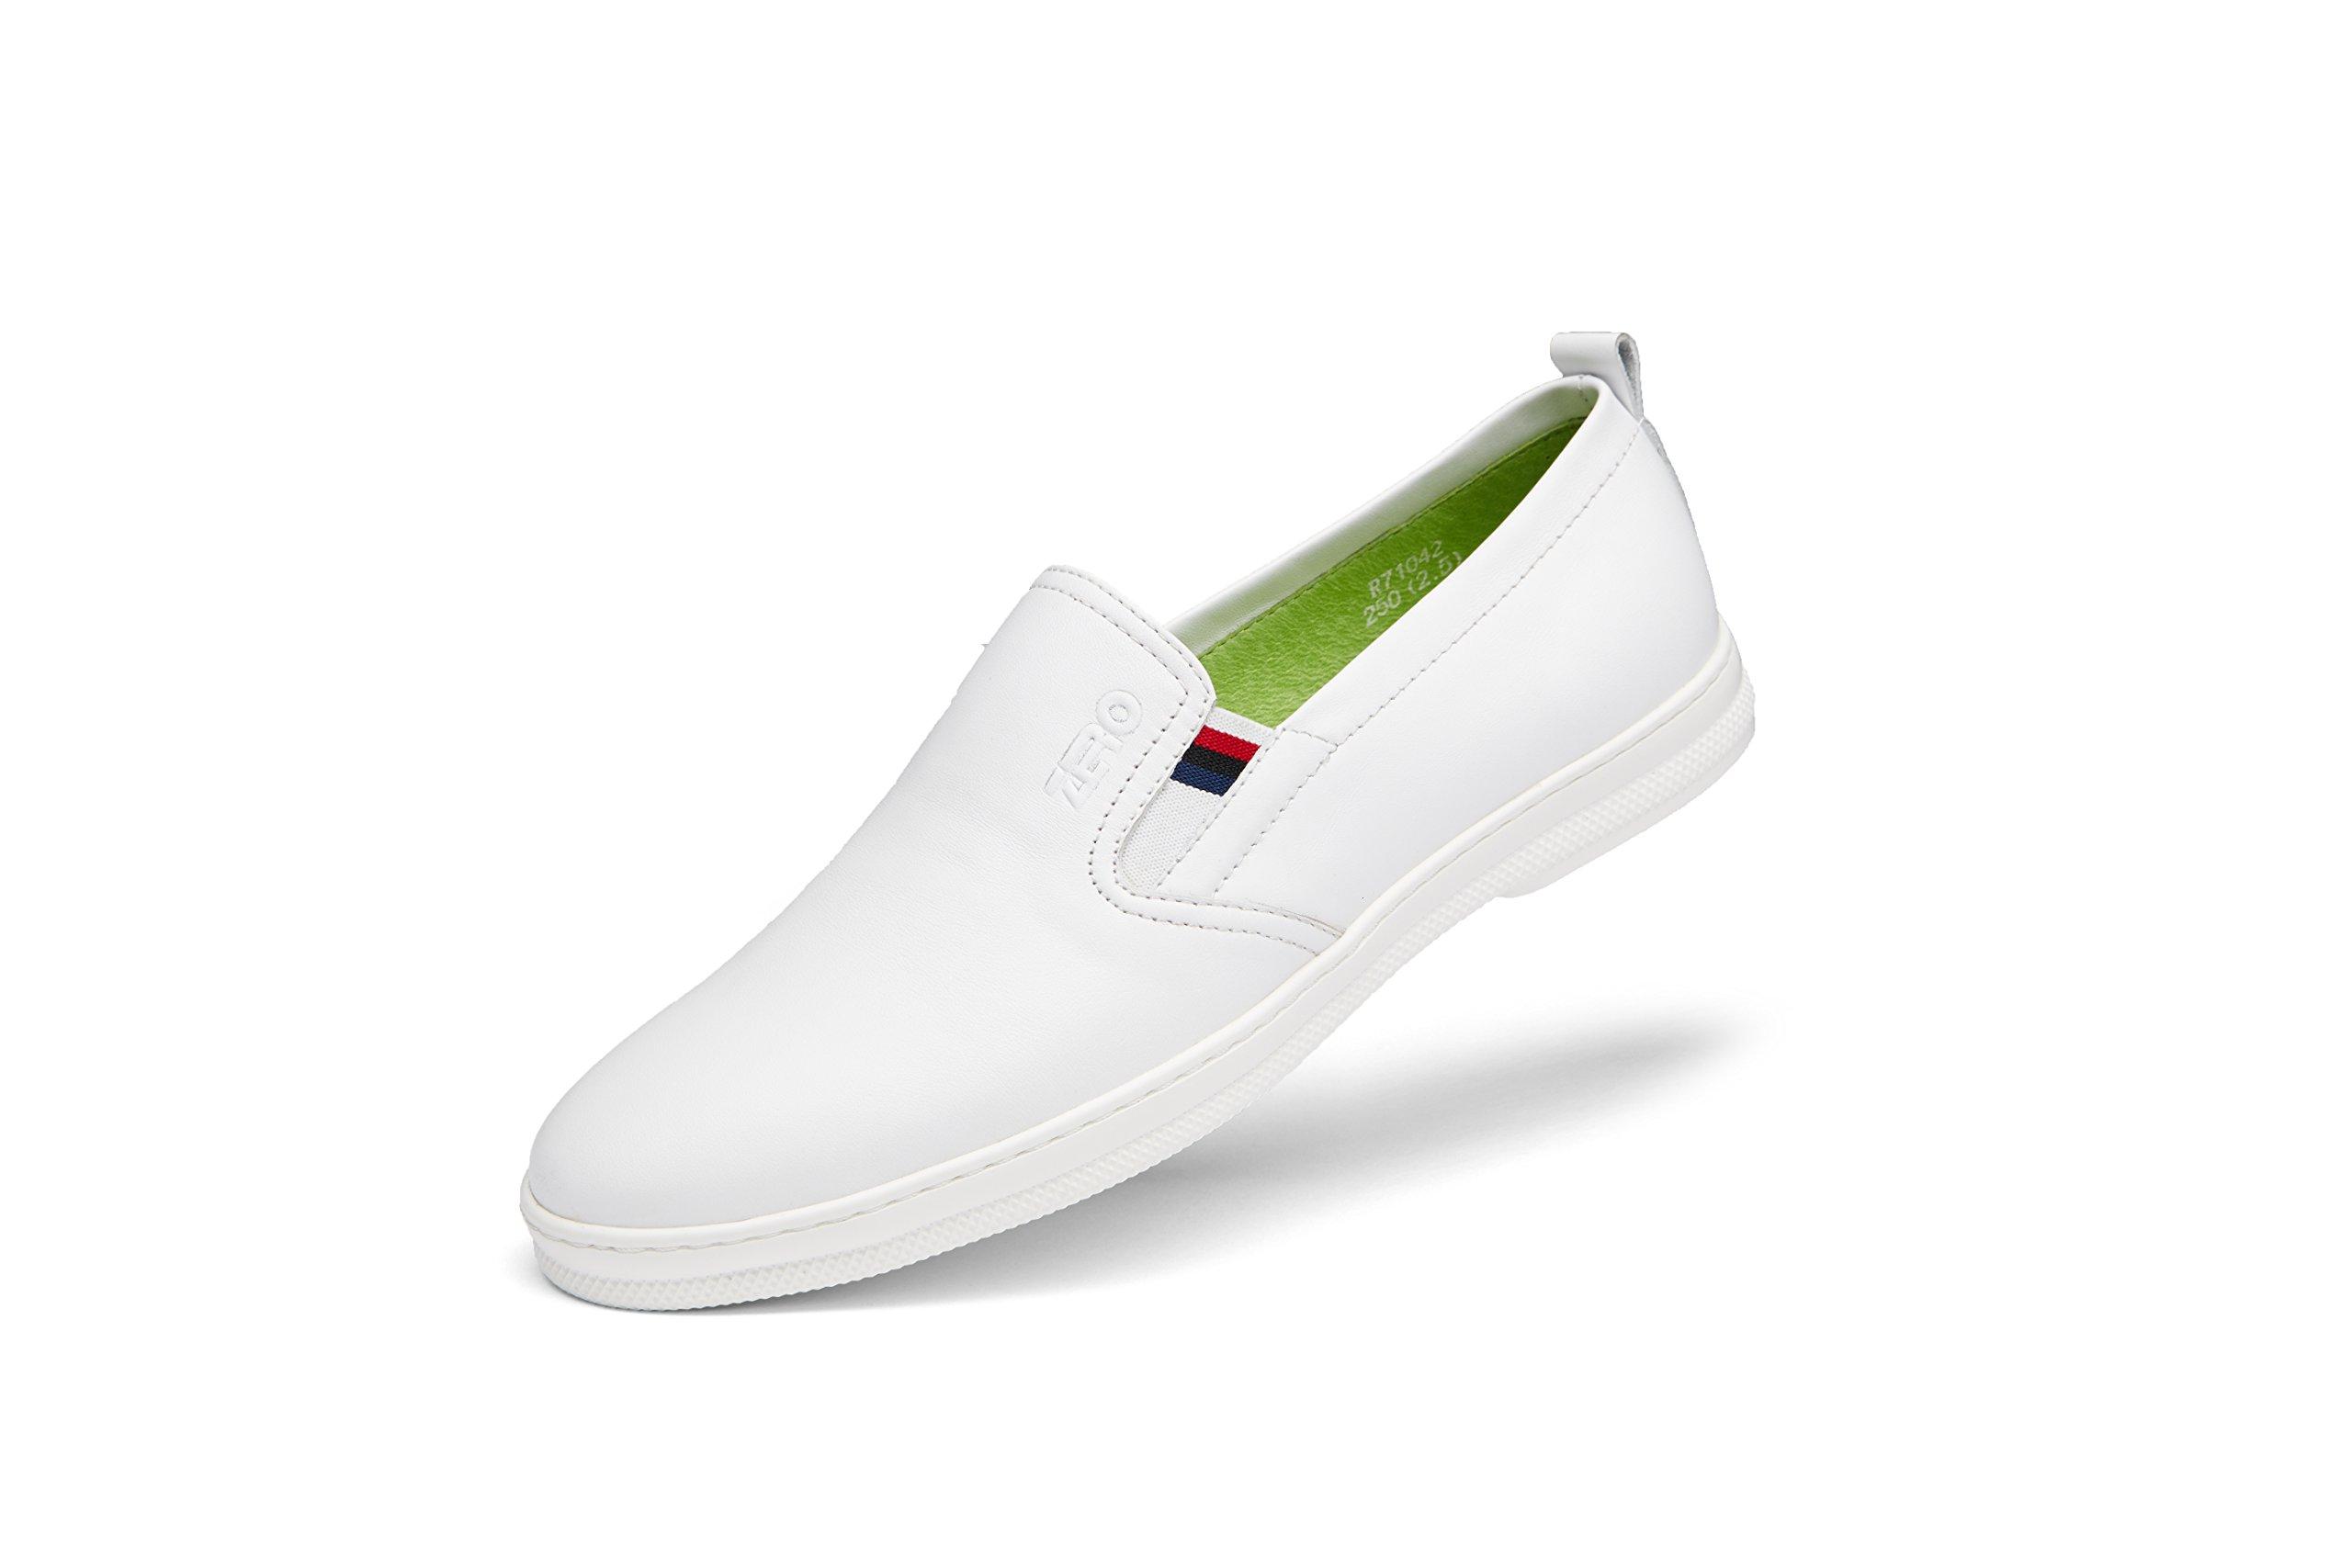 ZRO Men's Modern Slip-On Loafer Fashion Casual Walking Shoe White US 10